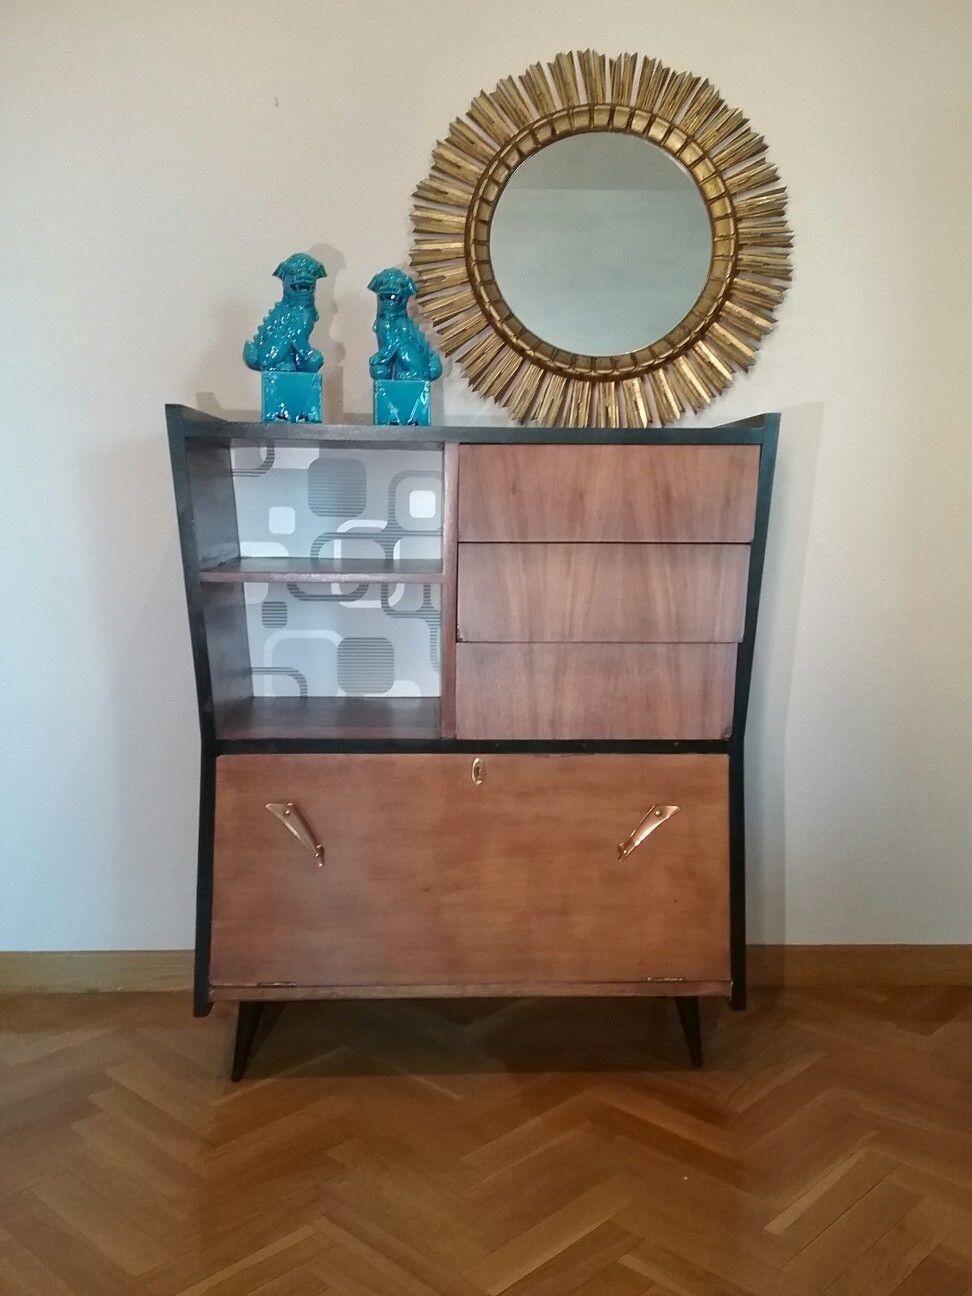 Aparador Vintage Mueble Bar Dise O N Rdico Alemania Circa A Os 50  # Muebles Mocholi